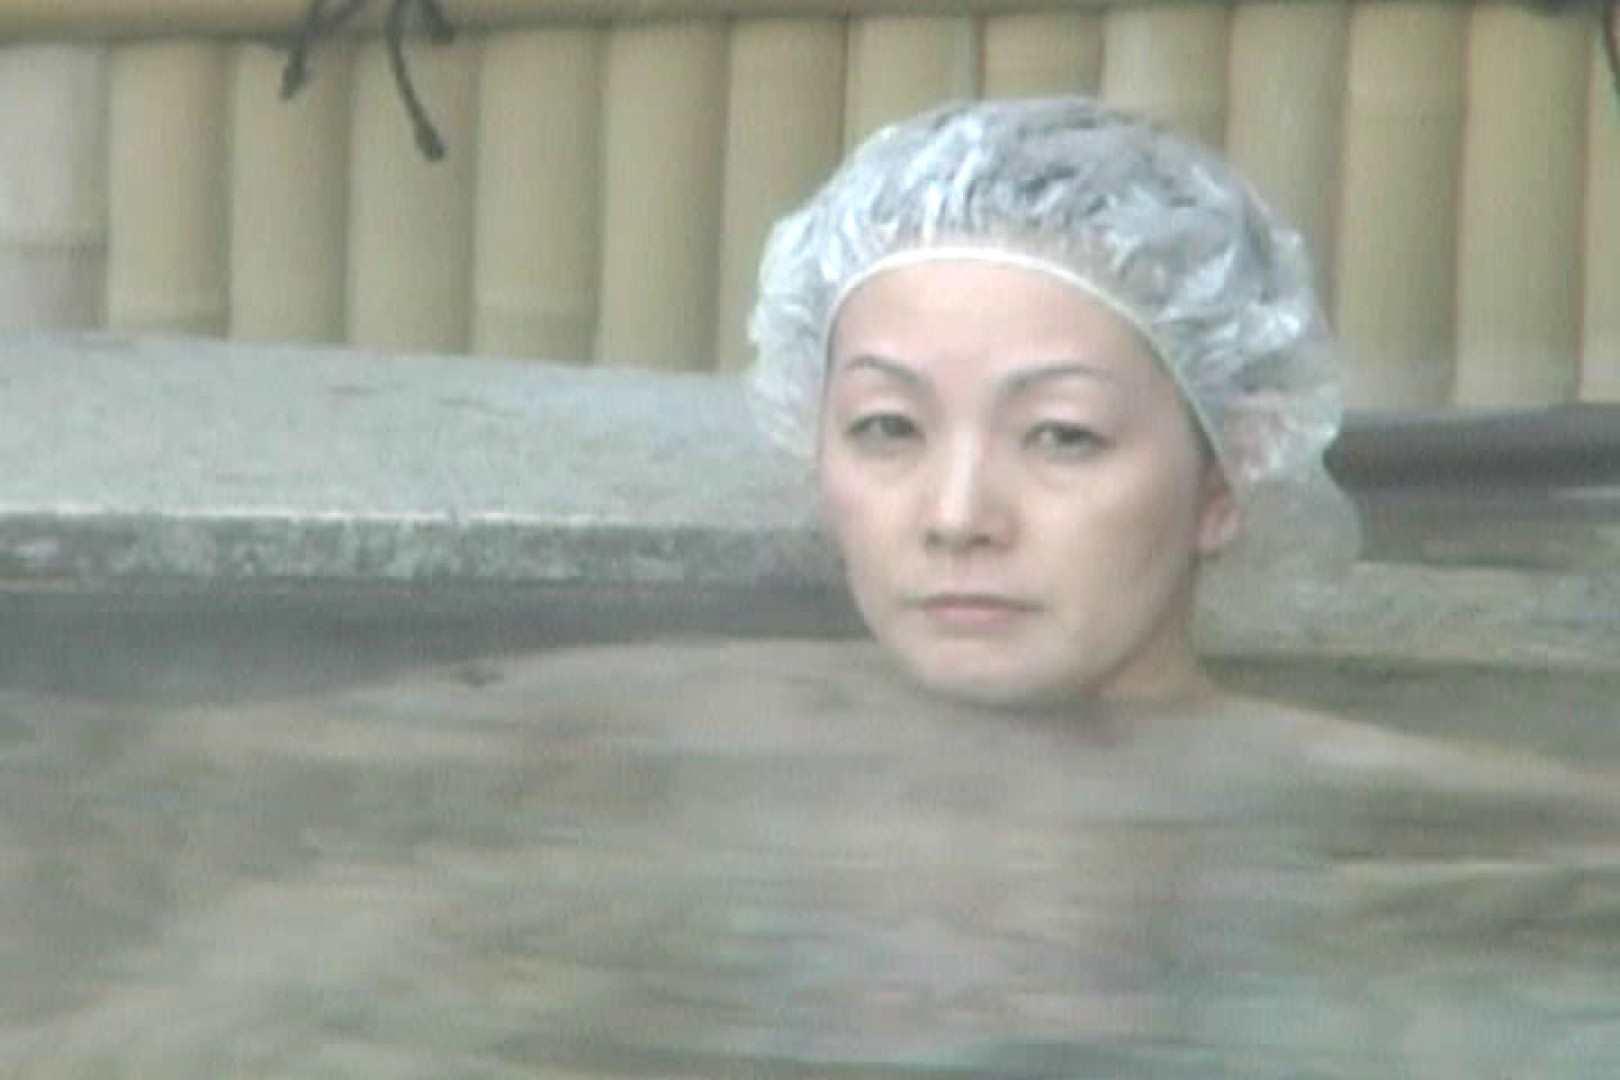 Aquaな露天風呂Vol.592 盗撮師作品  91pic 18